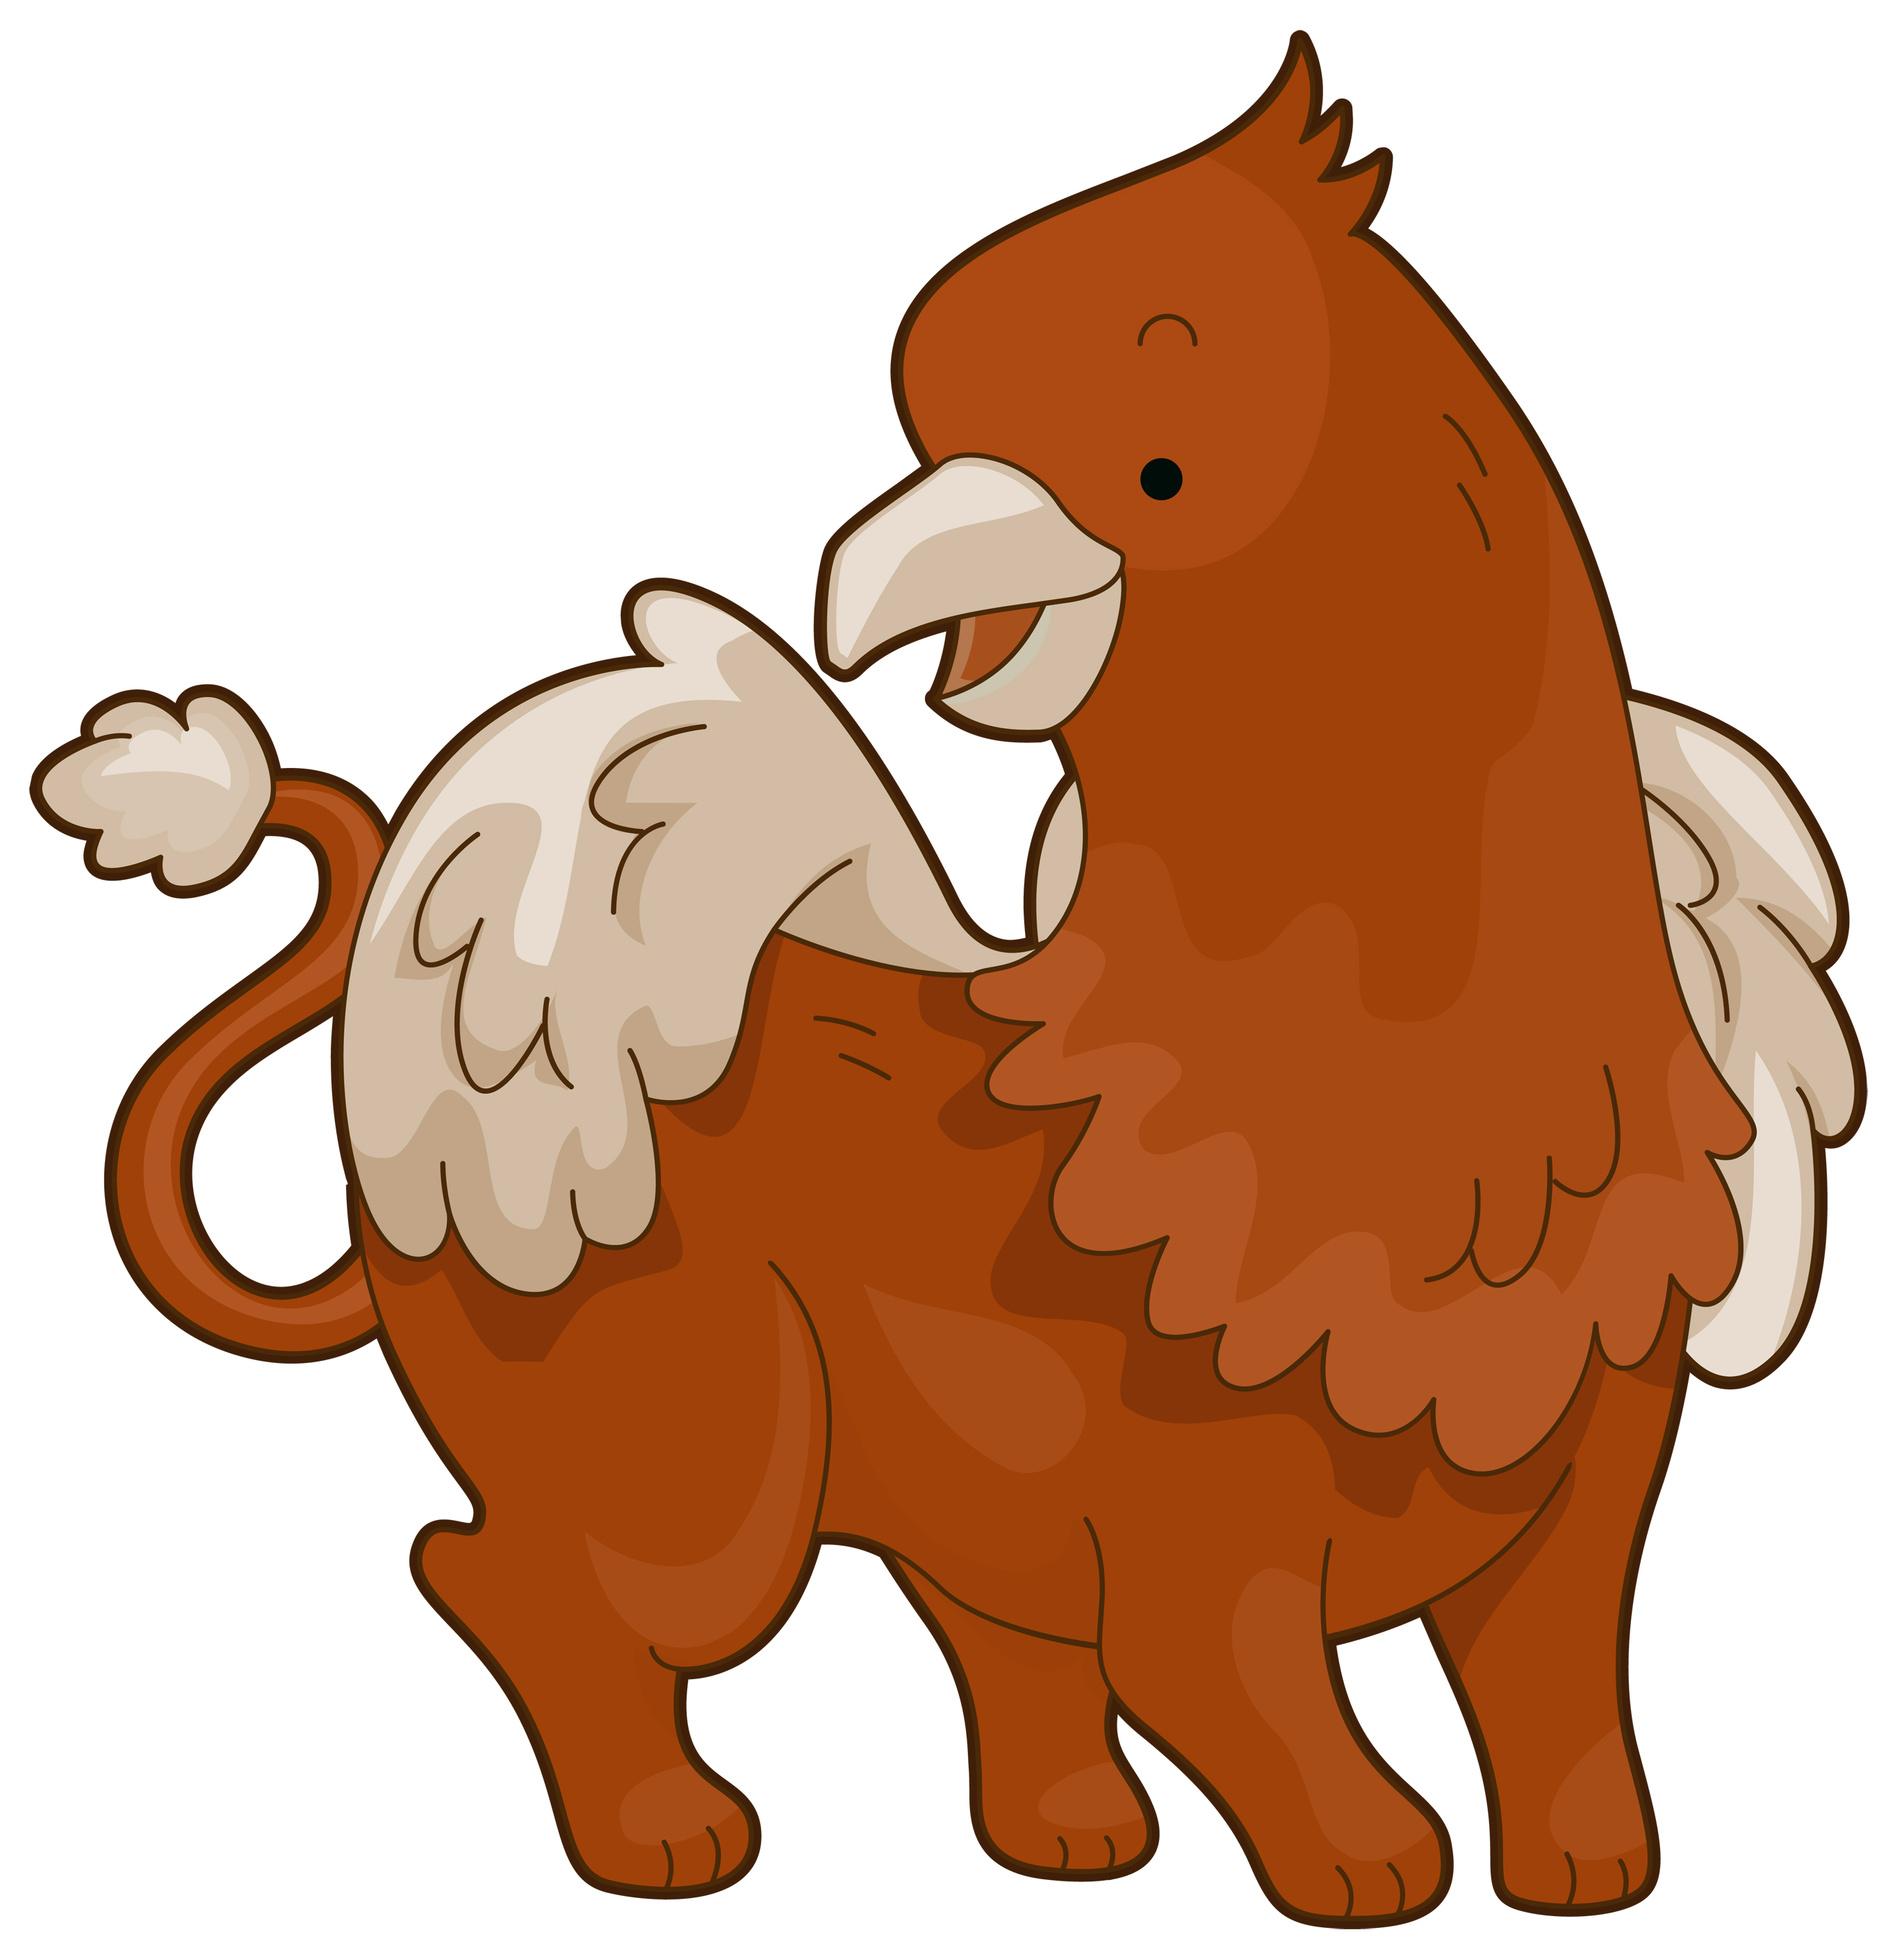 Gryphon Mascot